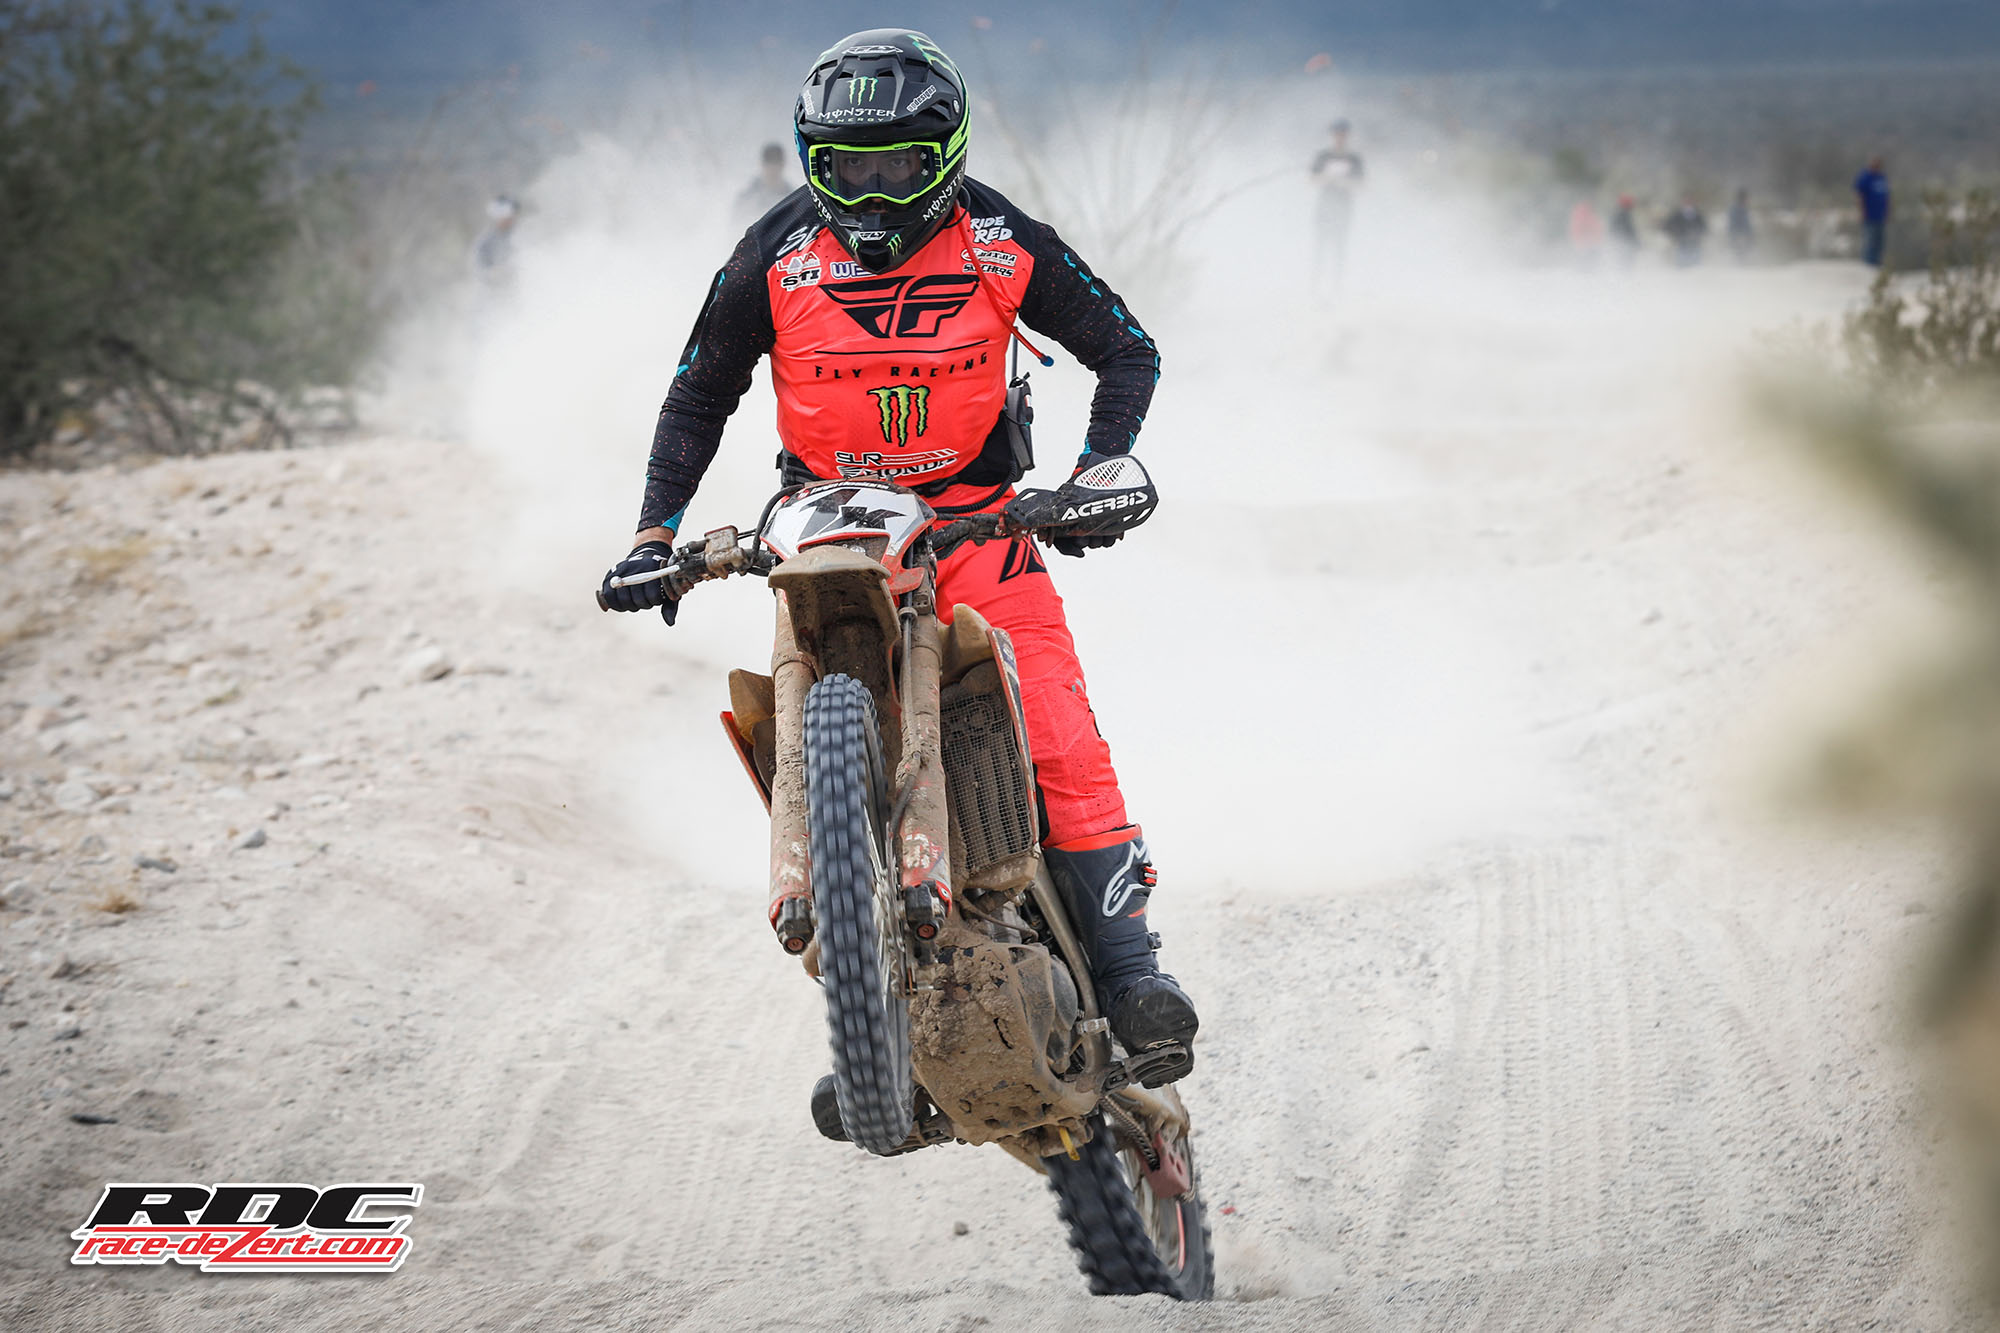 2019-score-baja1000-1x-westx1000-race-dezert-001.jpg